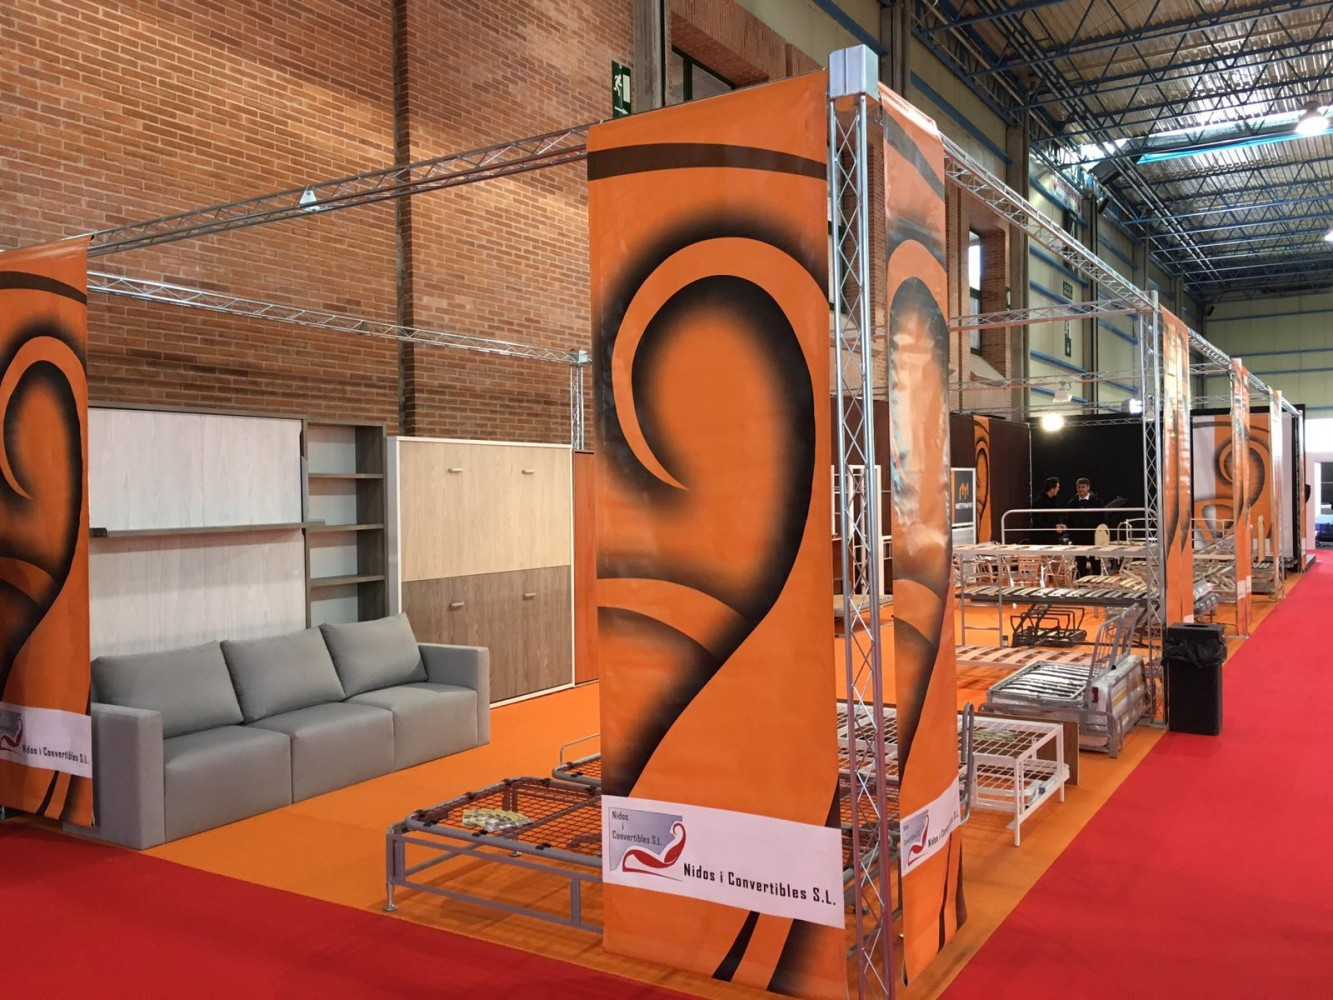 Galeria feria zaragoza 2016 nidosiconvertibles - Galeria comercial del mueble arganda ...